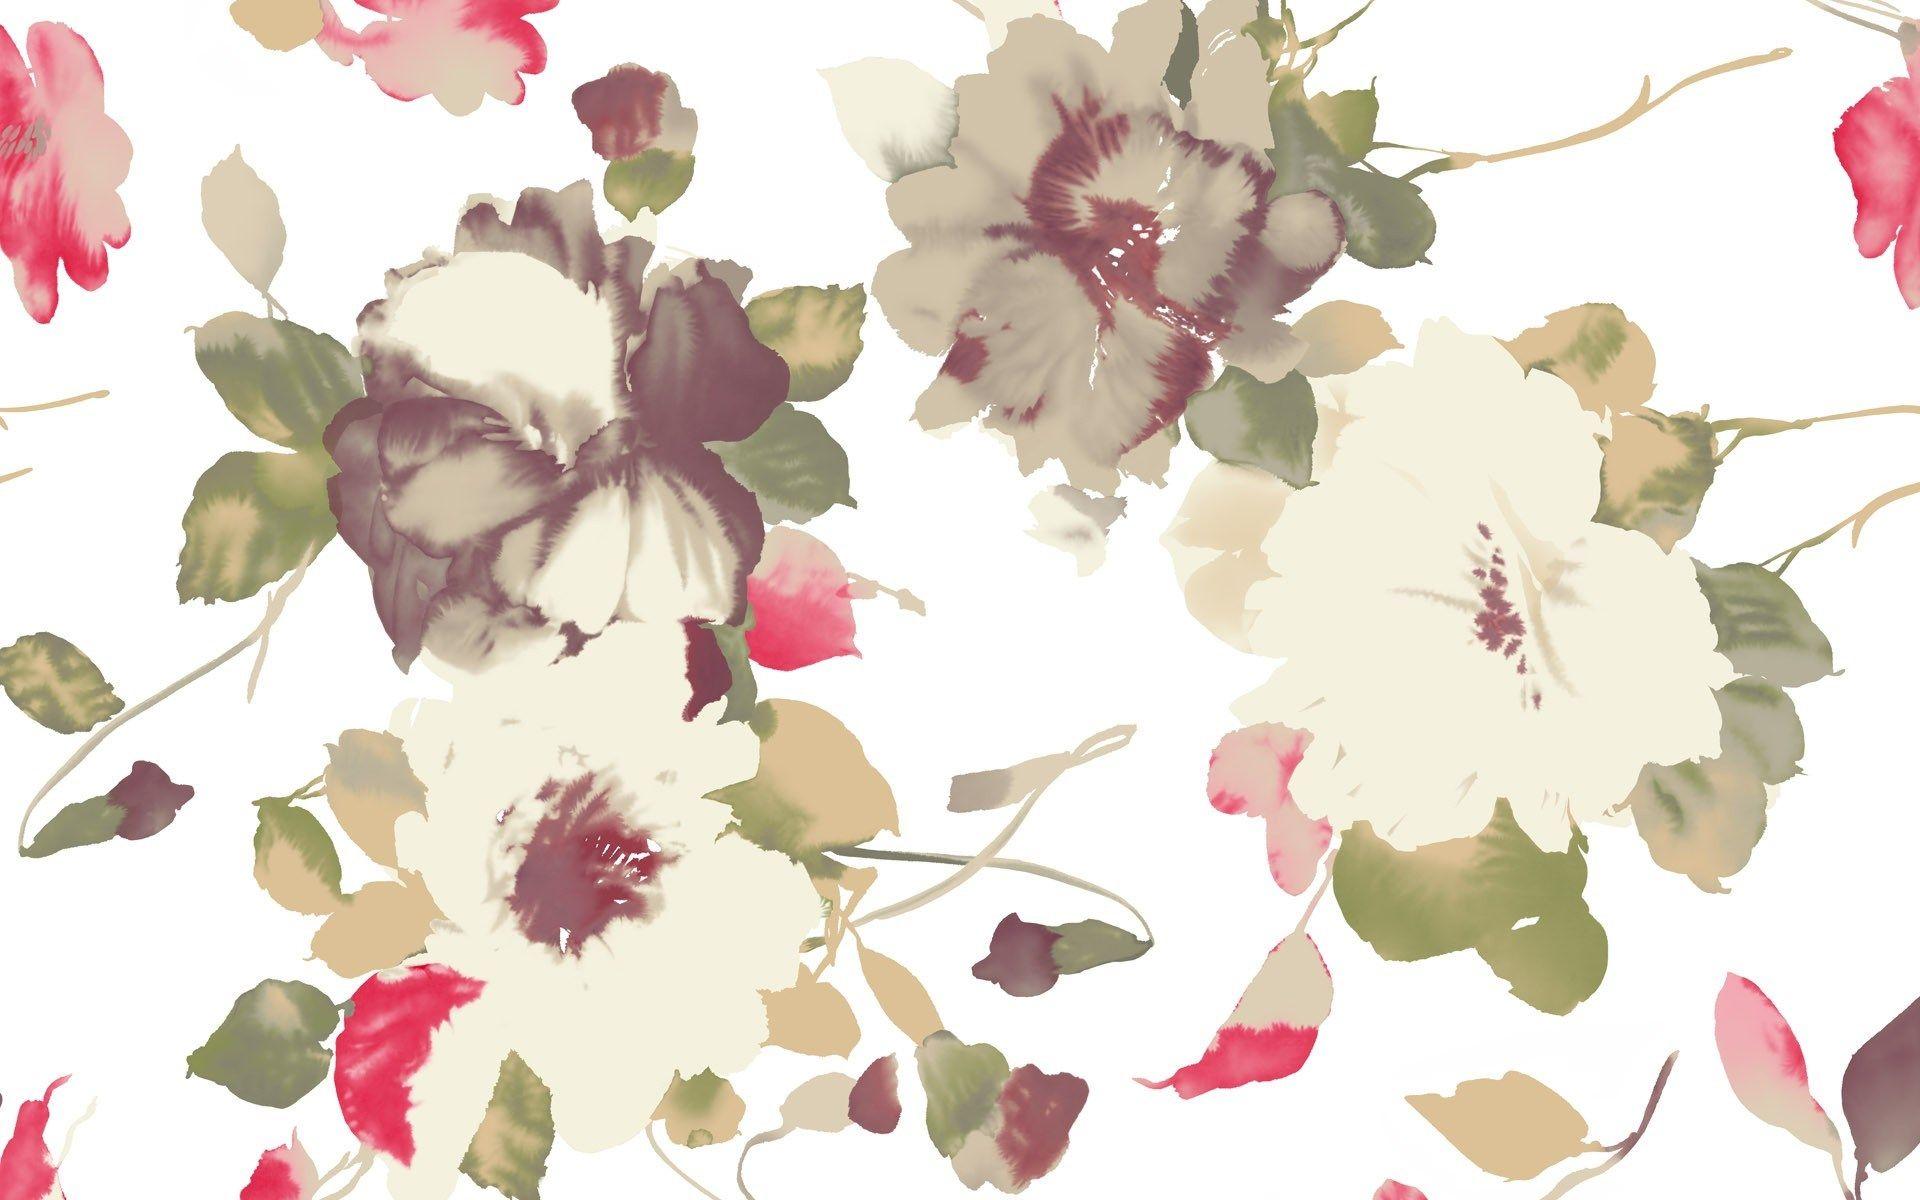 Vintage Flower Wallpapers For Mac Desktop